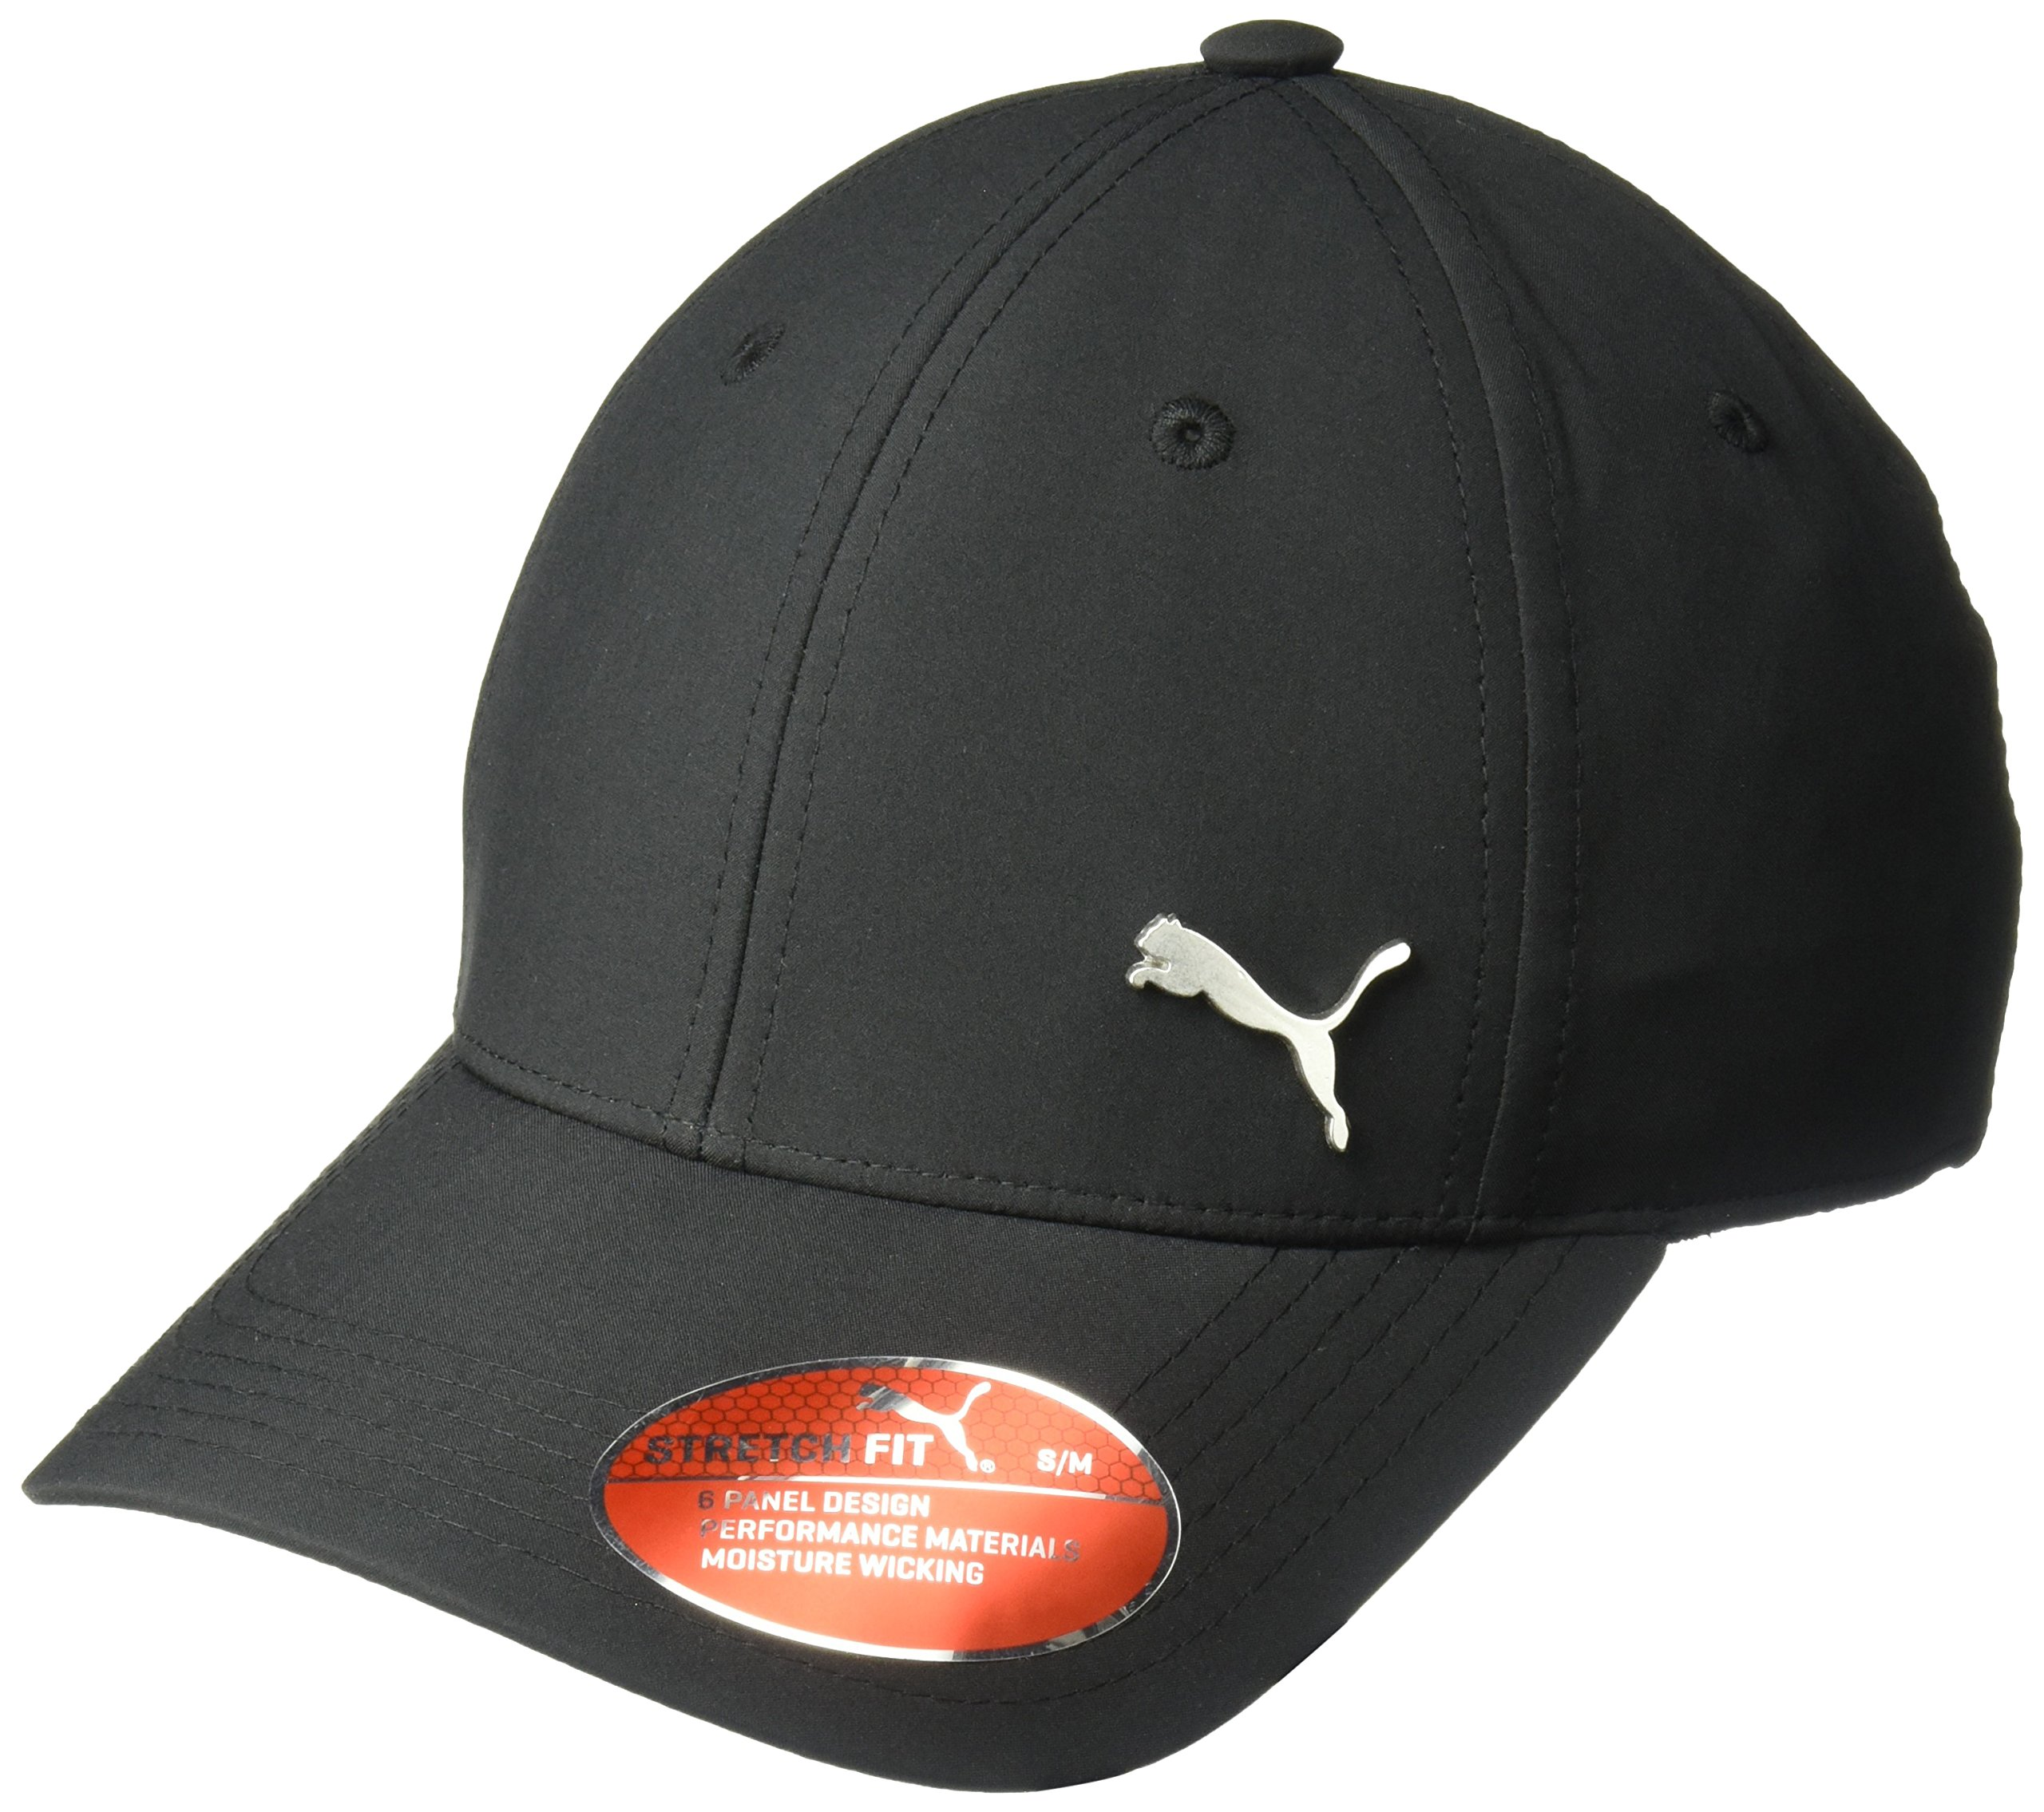 PUMA Men's Evercat Alloy Stretch Fit Cap